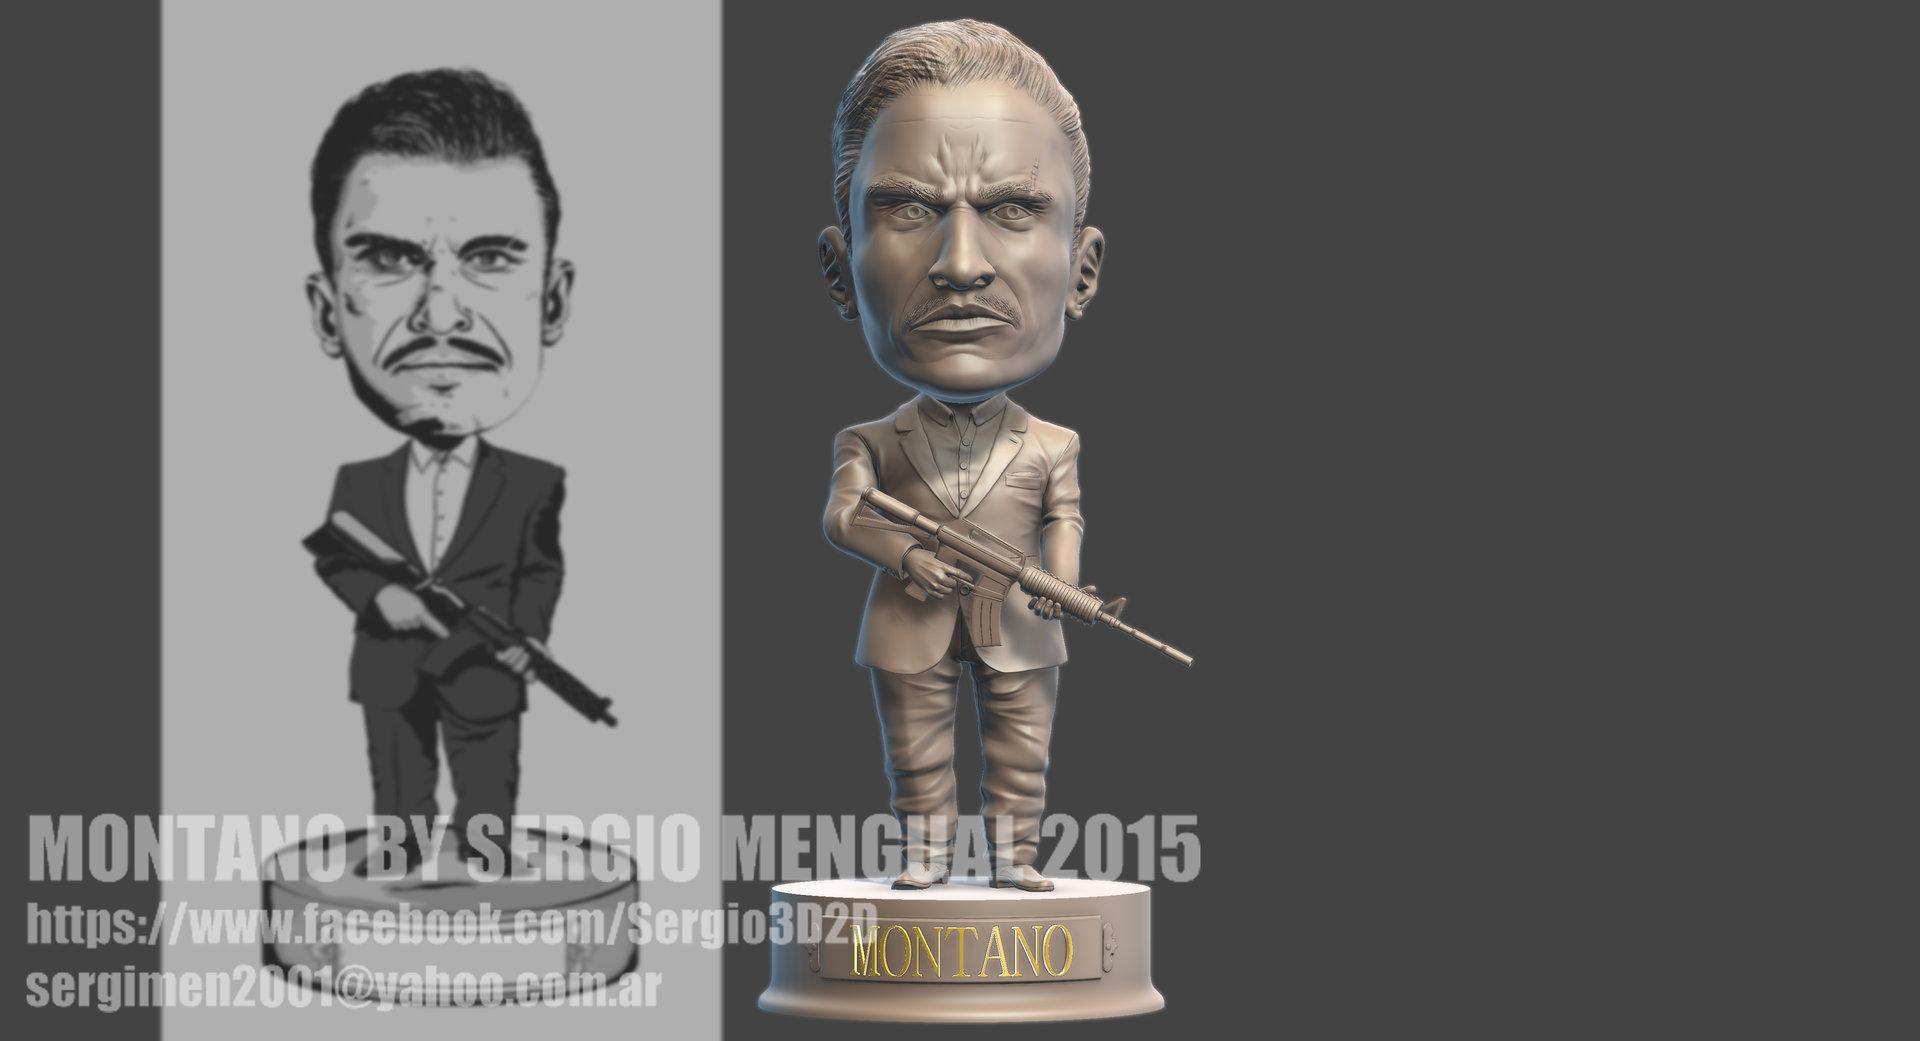 Sergio gabriel mengual montano final2